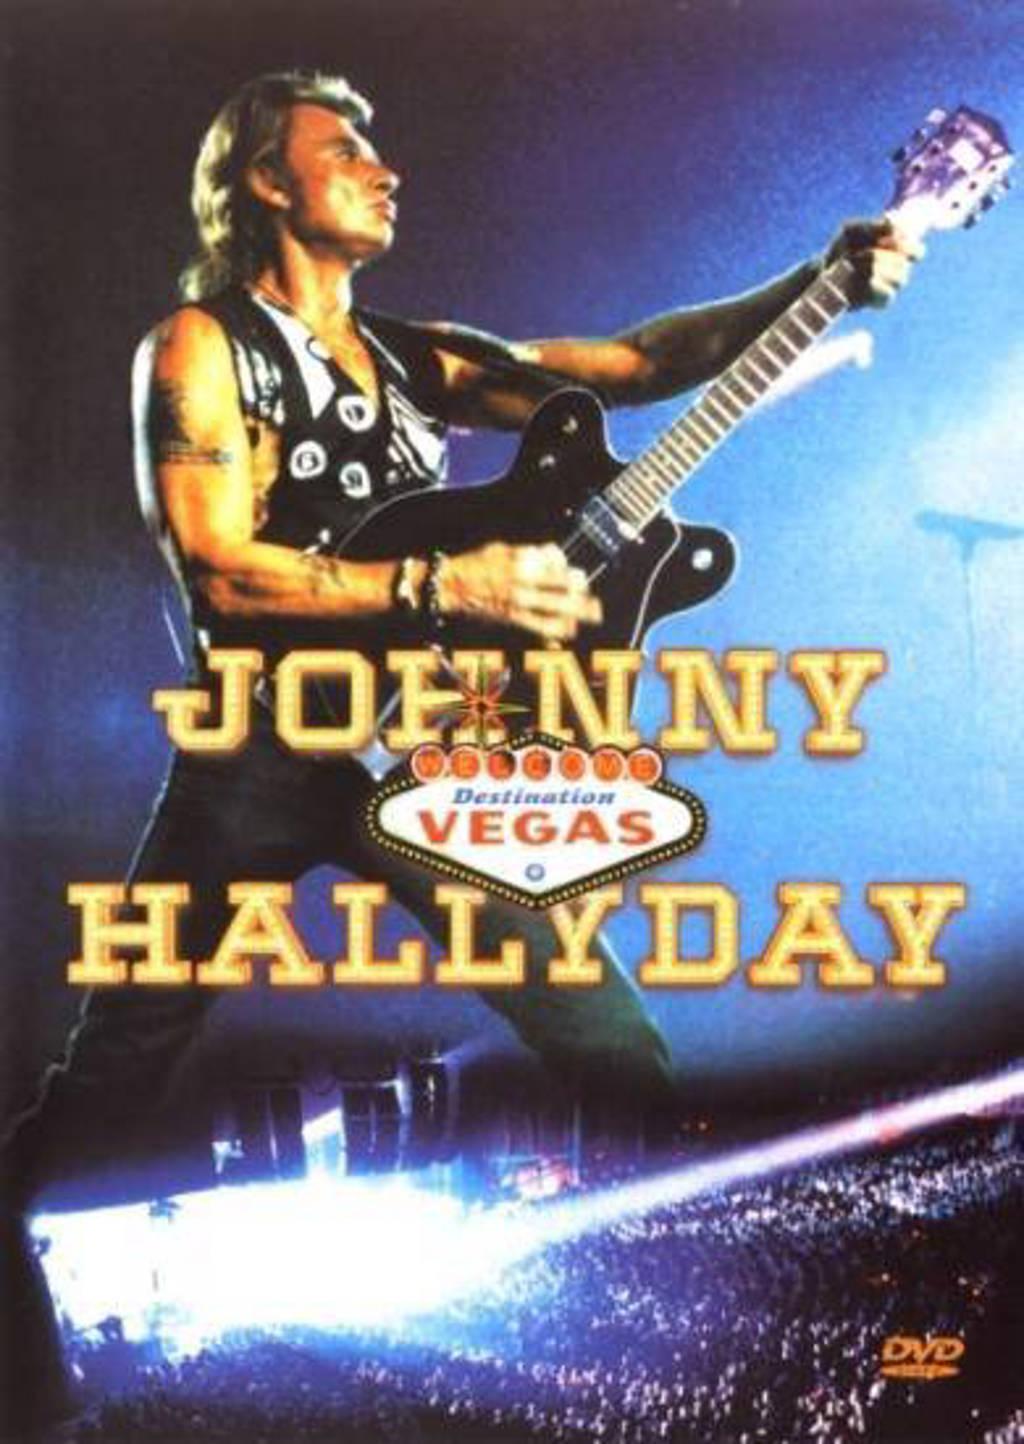 Johnny Hallyday - Destination Vegas 96 (DVD)